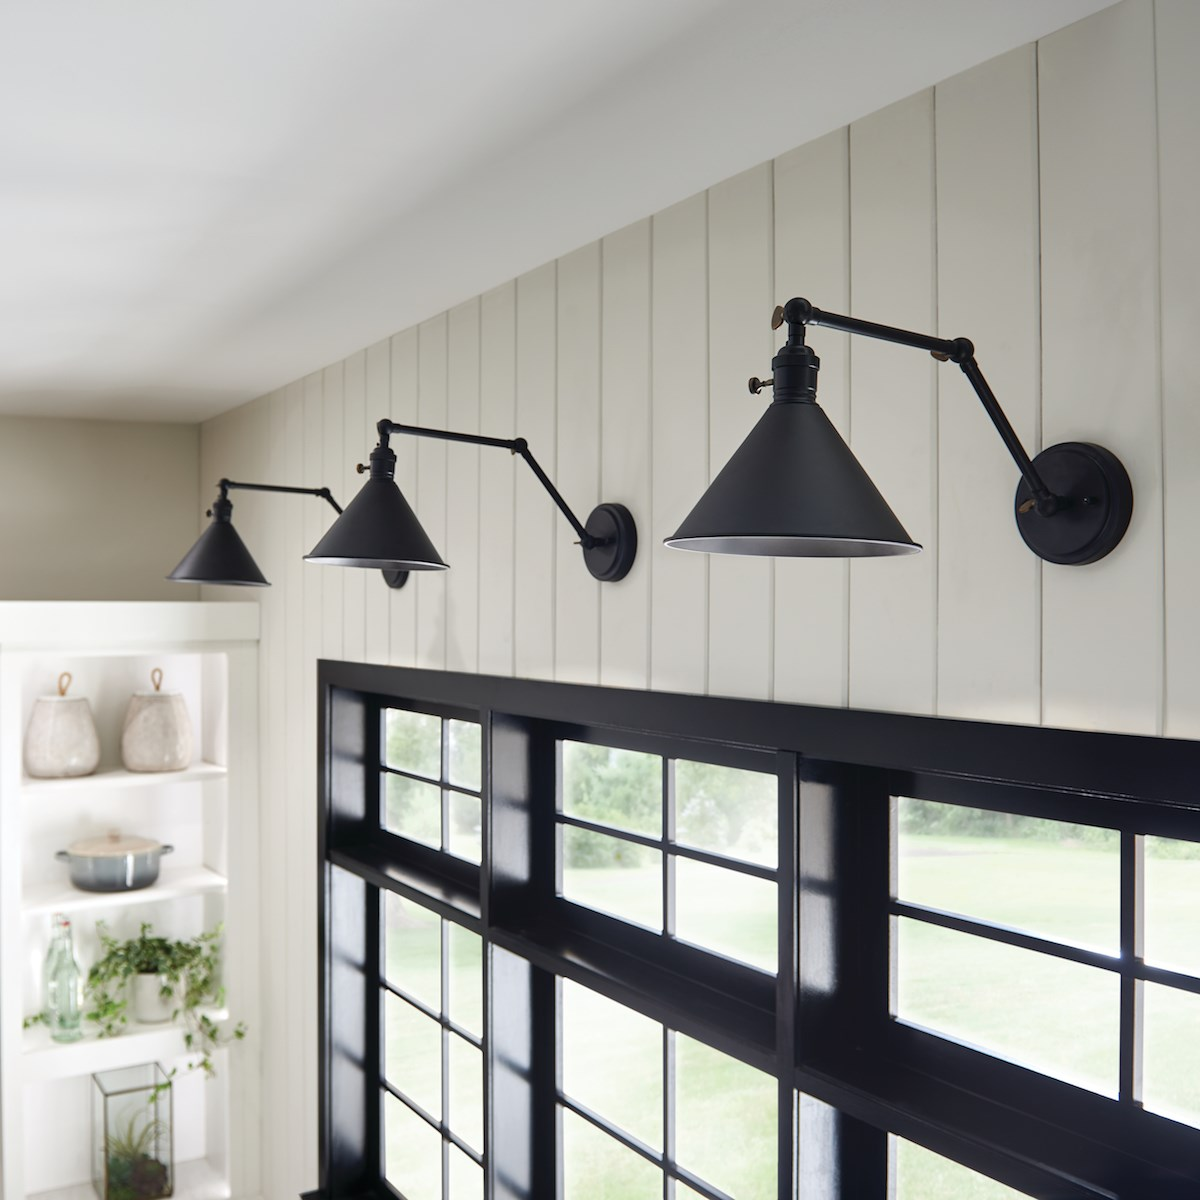 Ellerbeck™ 1 Light Wall Sconce Black | Kichler Lighting